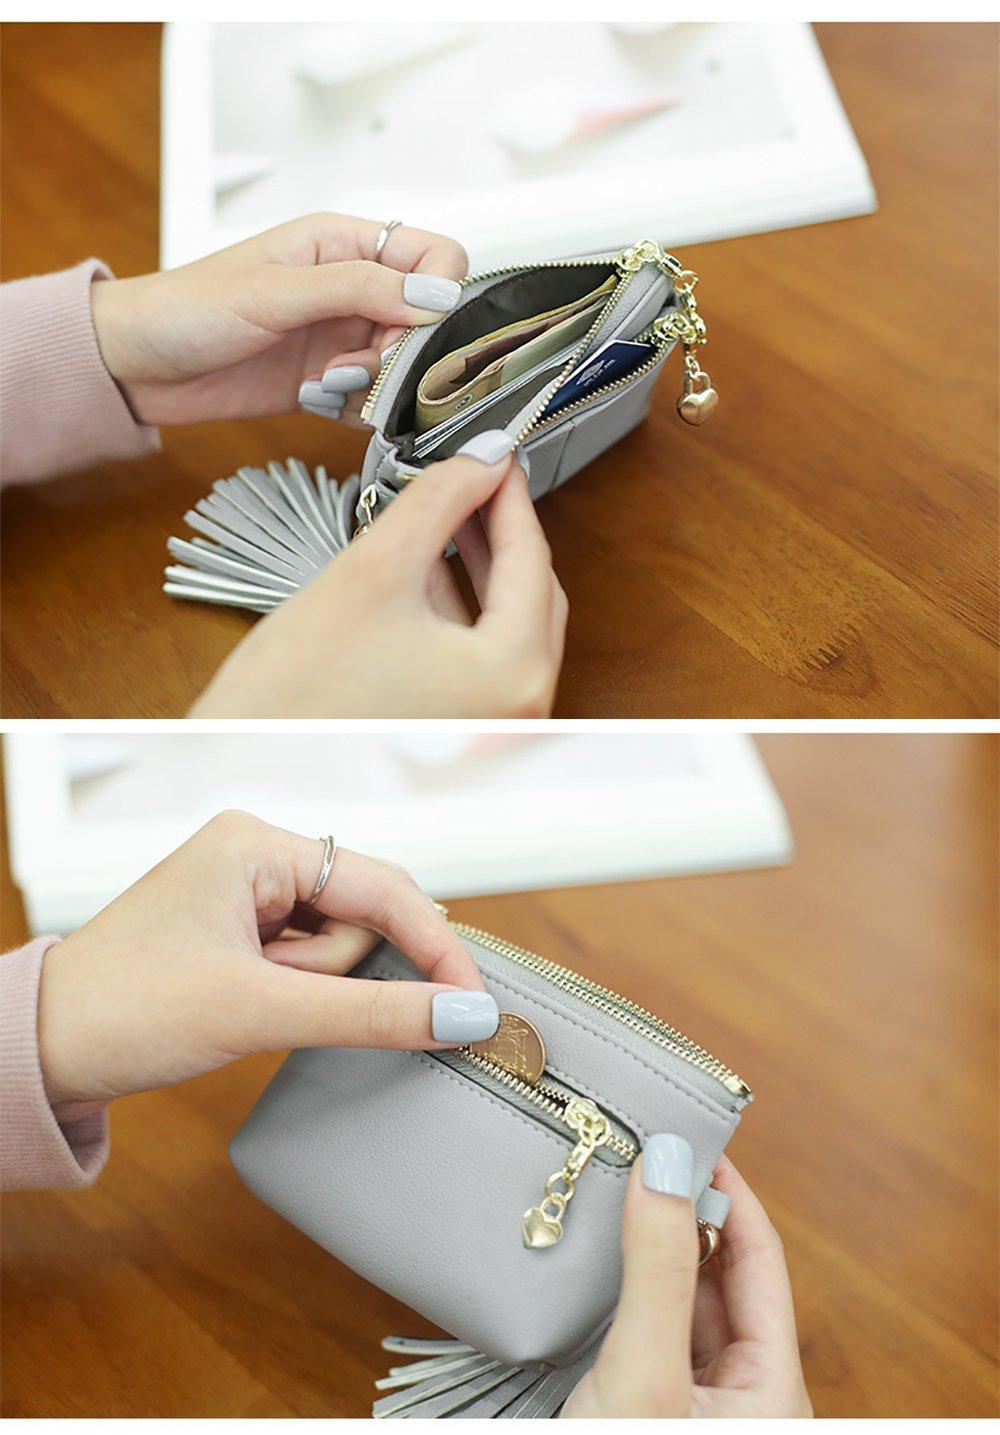 Womens RFID Blocking Slim Key Holder Wallet Card Holder Coin Cash Key Organizer with Ring Tassel (#2 Pink) by IFUNLE (Image #5)